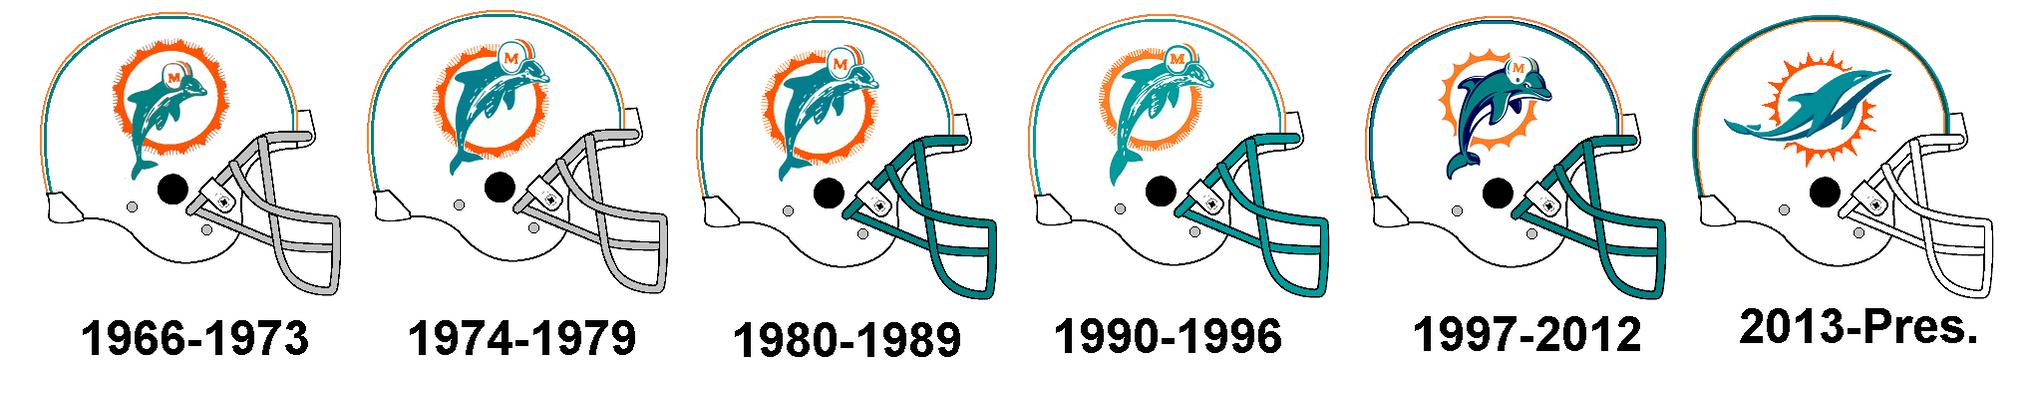 Redskins Helmet 2014 History of the Miami D...